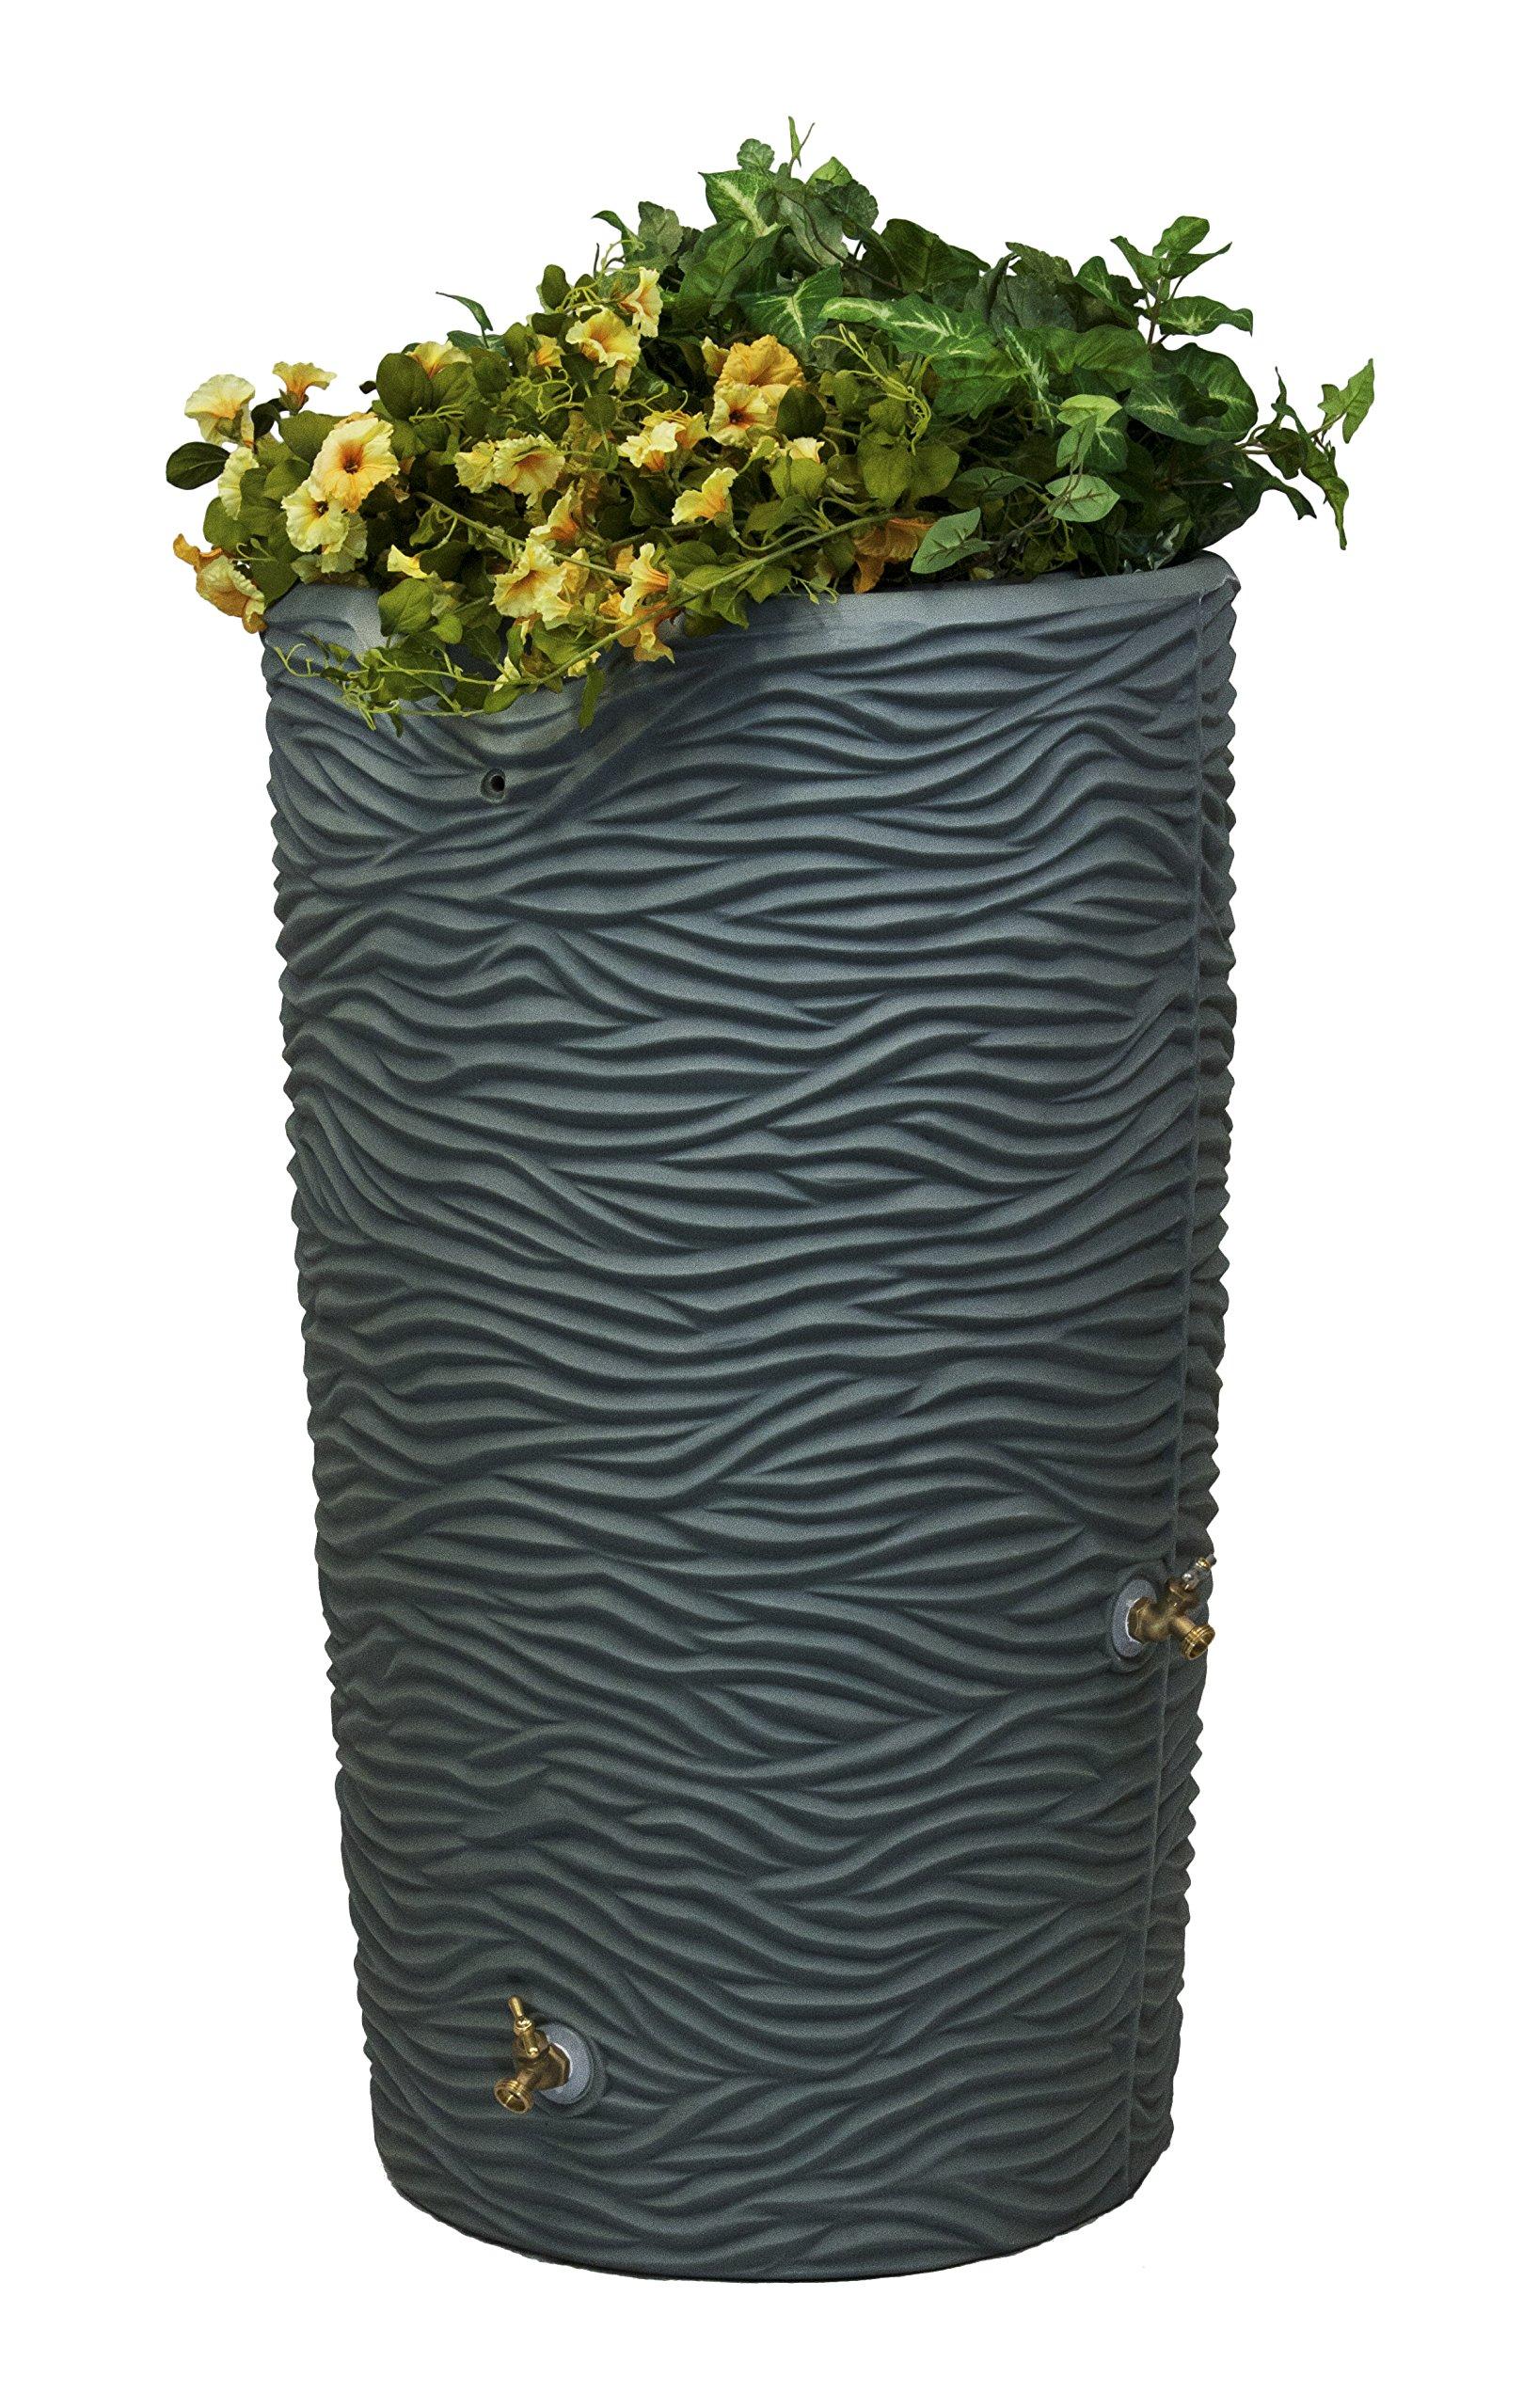 Good Ideas IMP-L65-GRY Impressions Palm Rain Saver, 65-Gallon, Gray